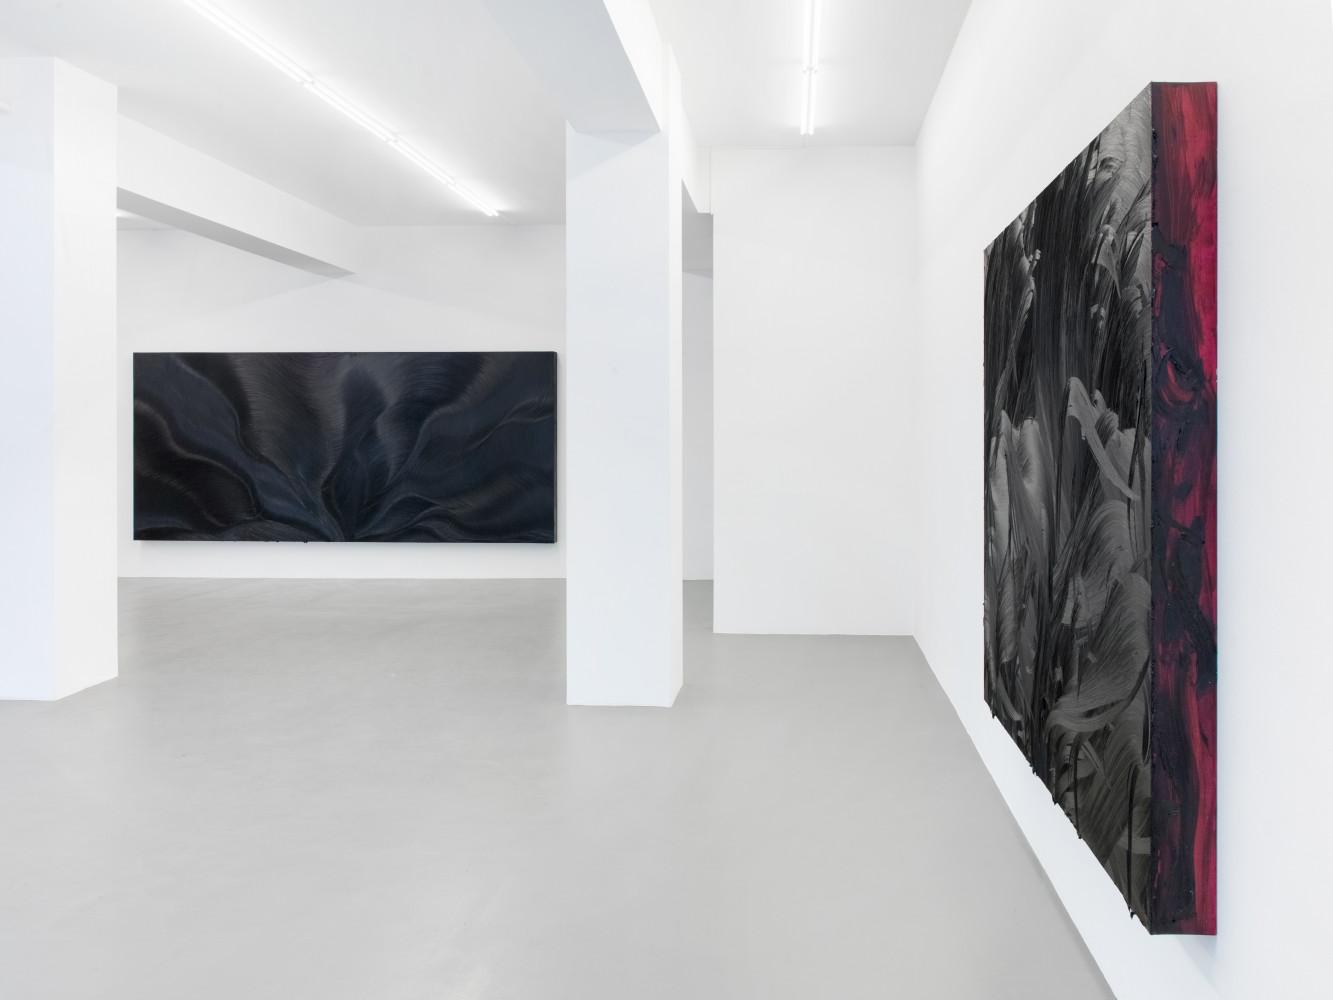 Jason Martin, 'Vertigo', Installation view, Buchmann Galerie, 2018